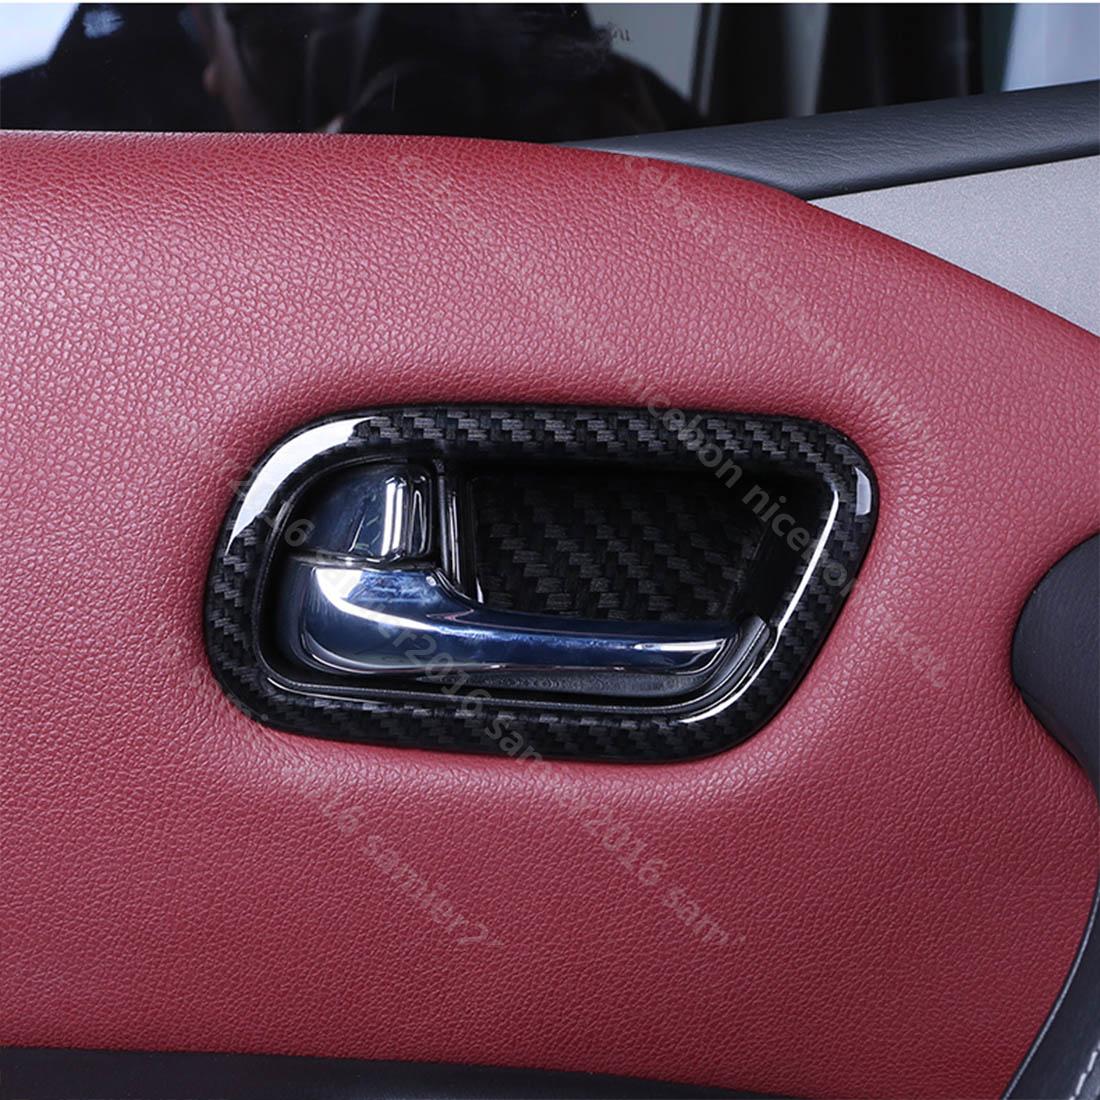 Carbon Fiber Chrome Interior handle bowl cover trim For Nissan Patrol Y62 2017+